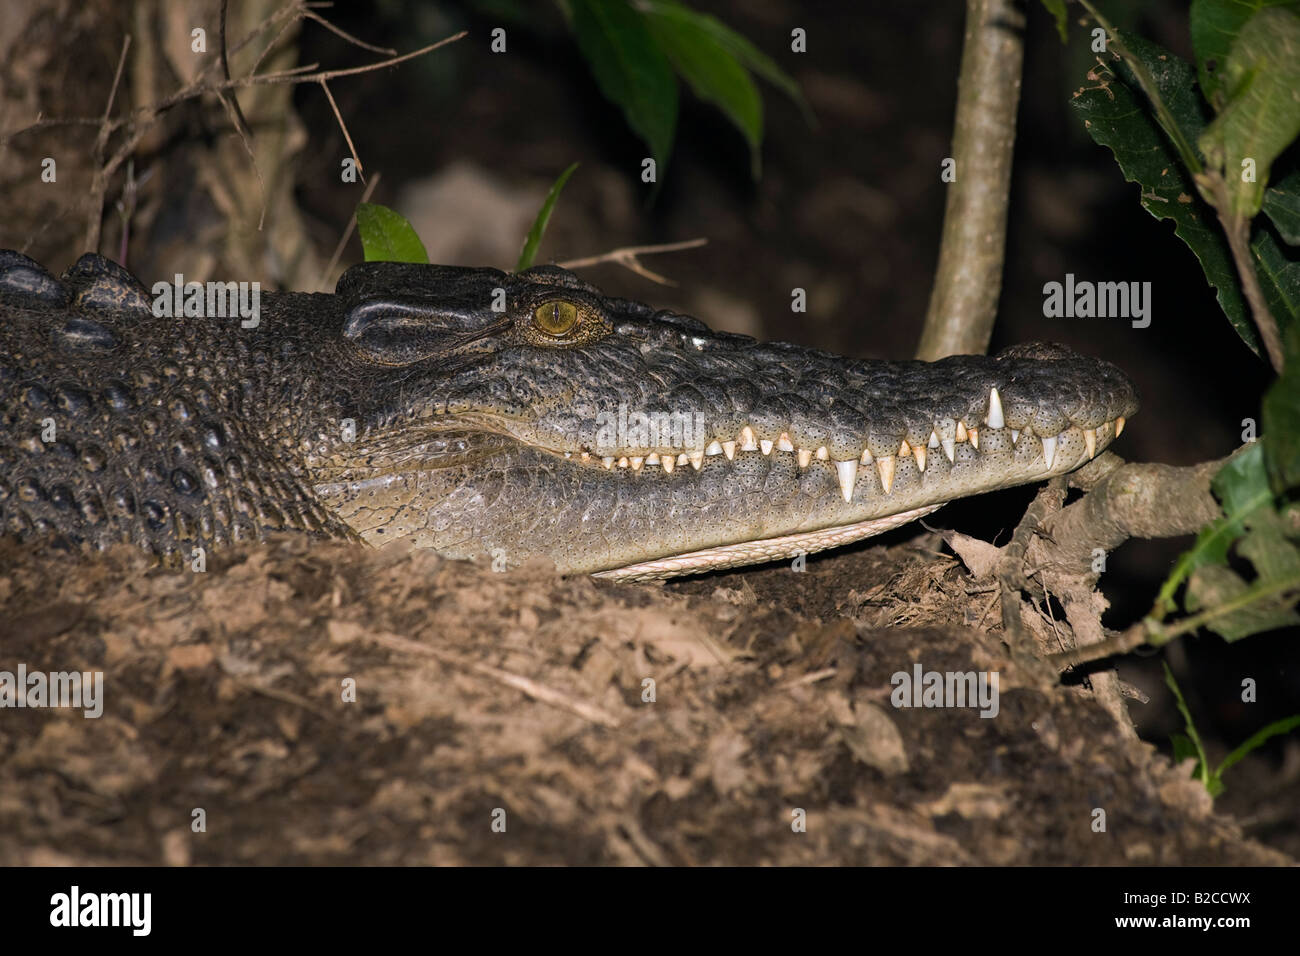 Wild Saltwater Crocodile Saltie Estuarine Crocodile Leistenkrokodil Crocodylus porosus spotlighting Australia Daintree - Stock Image